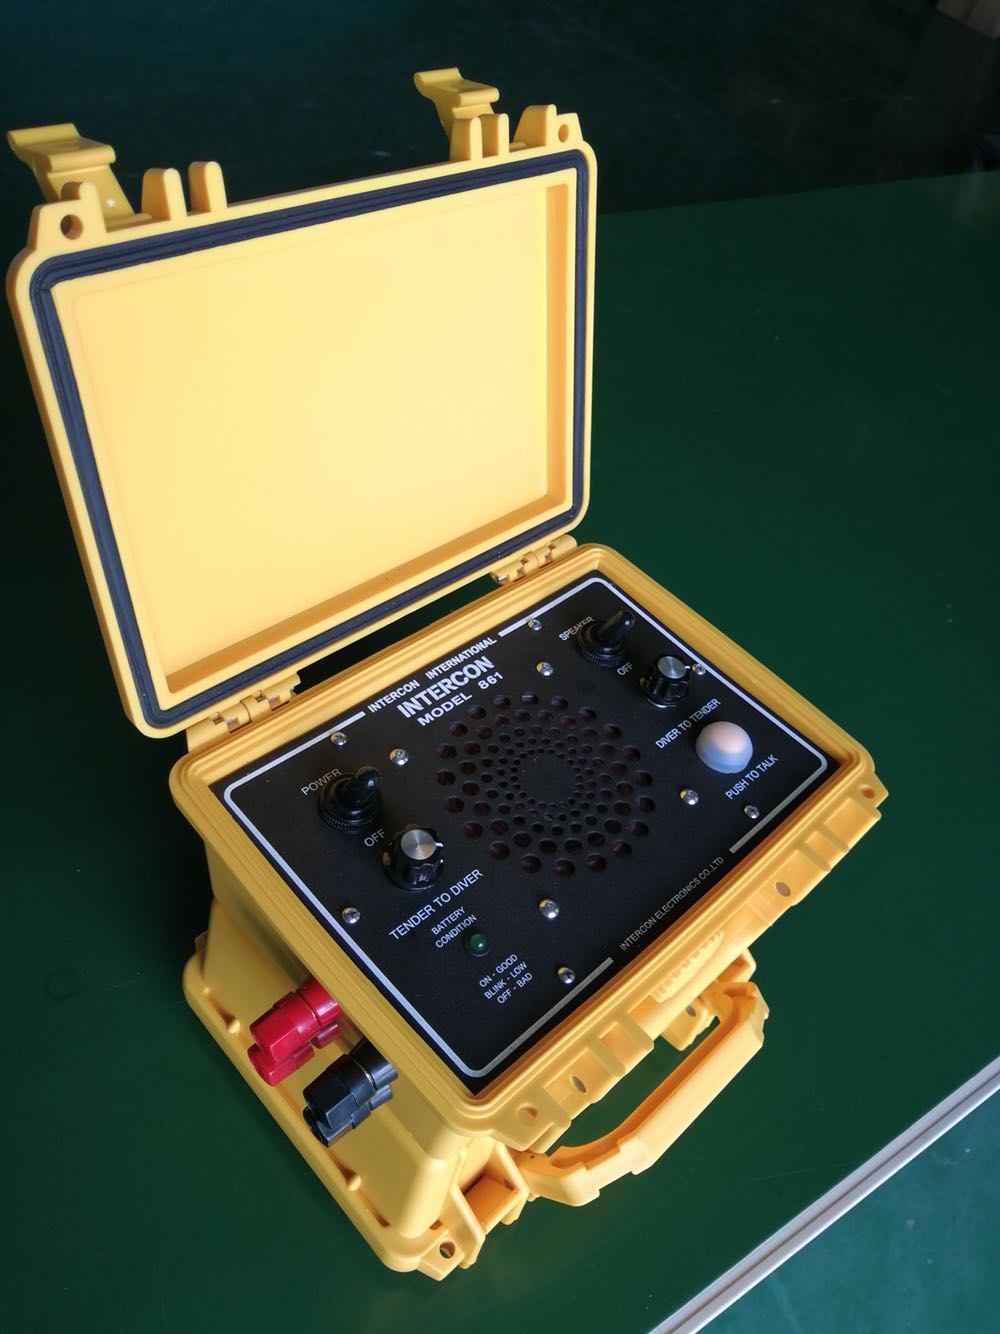 MZ300 Diving Telephone Intercom Diver Communicator Underwater Operation Communication System Diving Communication Equipment